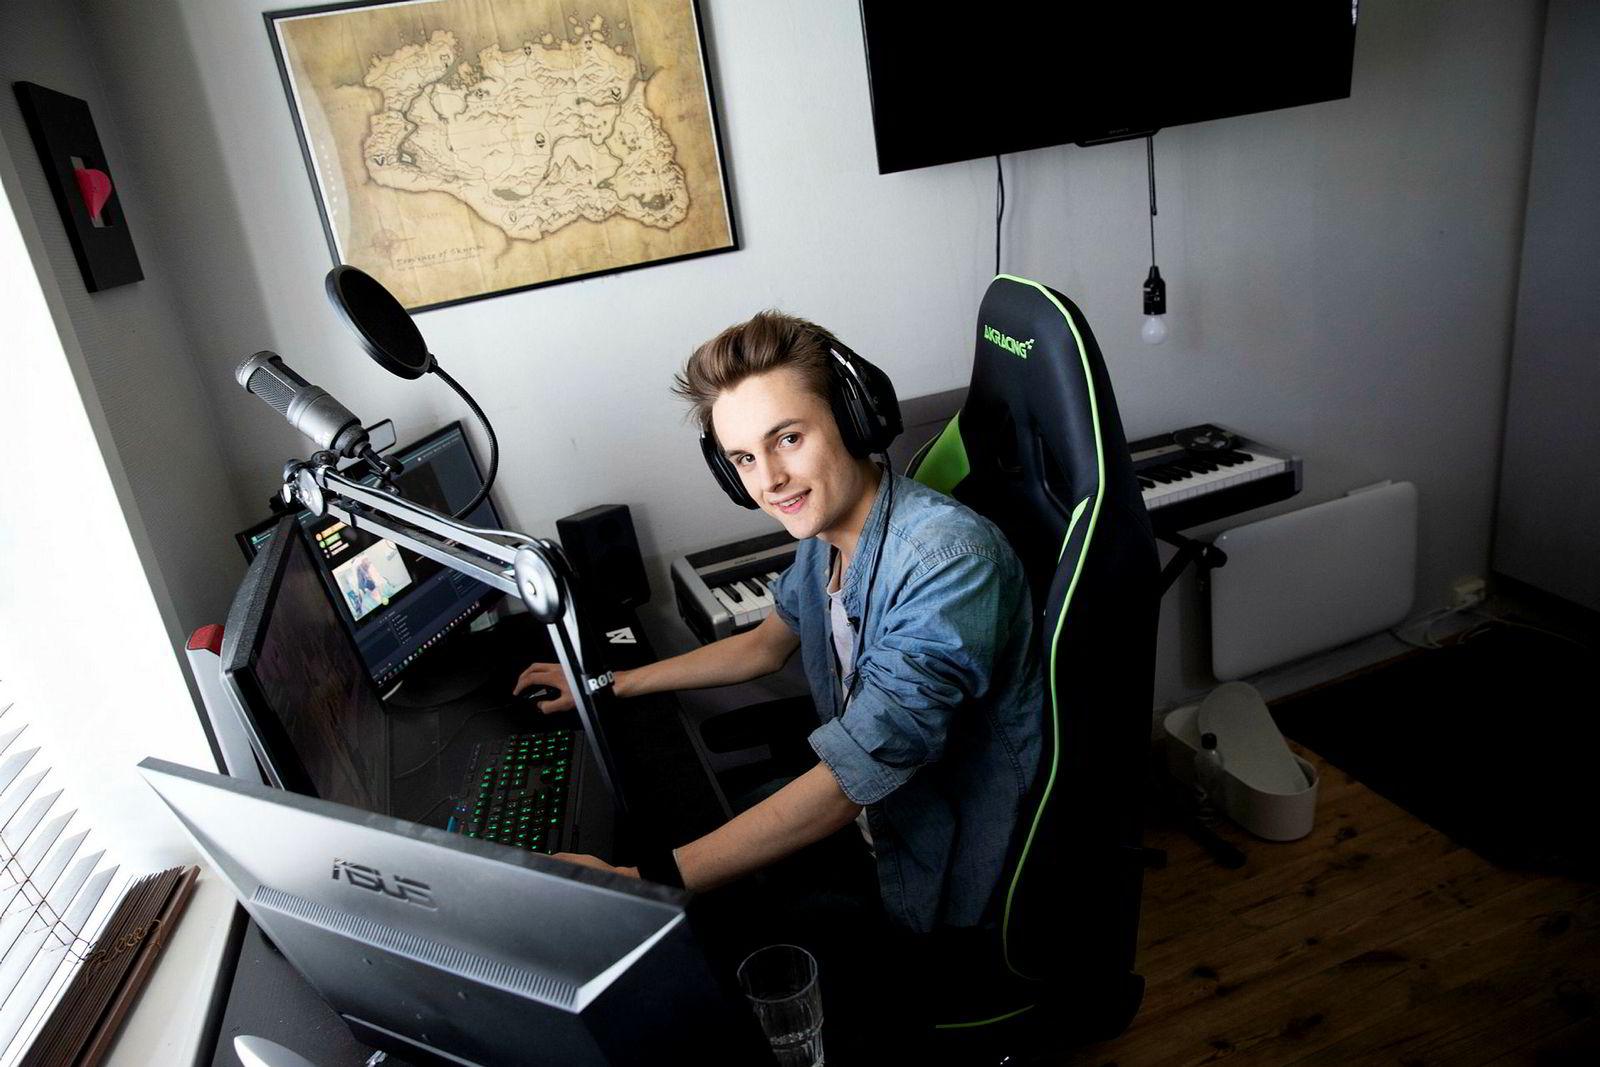 Flere ganger i uken lager Youtube-profilen Elias «KimePlays» Rådlund (20) videoer der han spiller Fortnite.